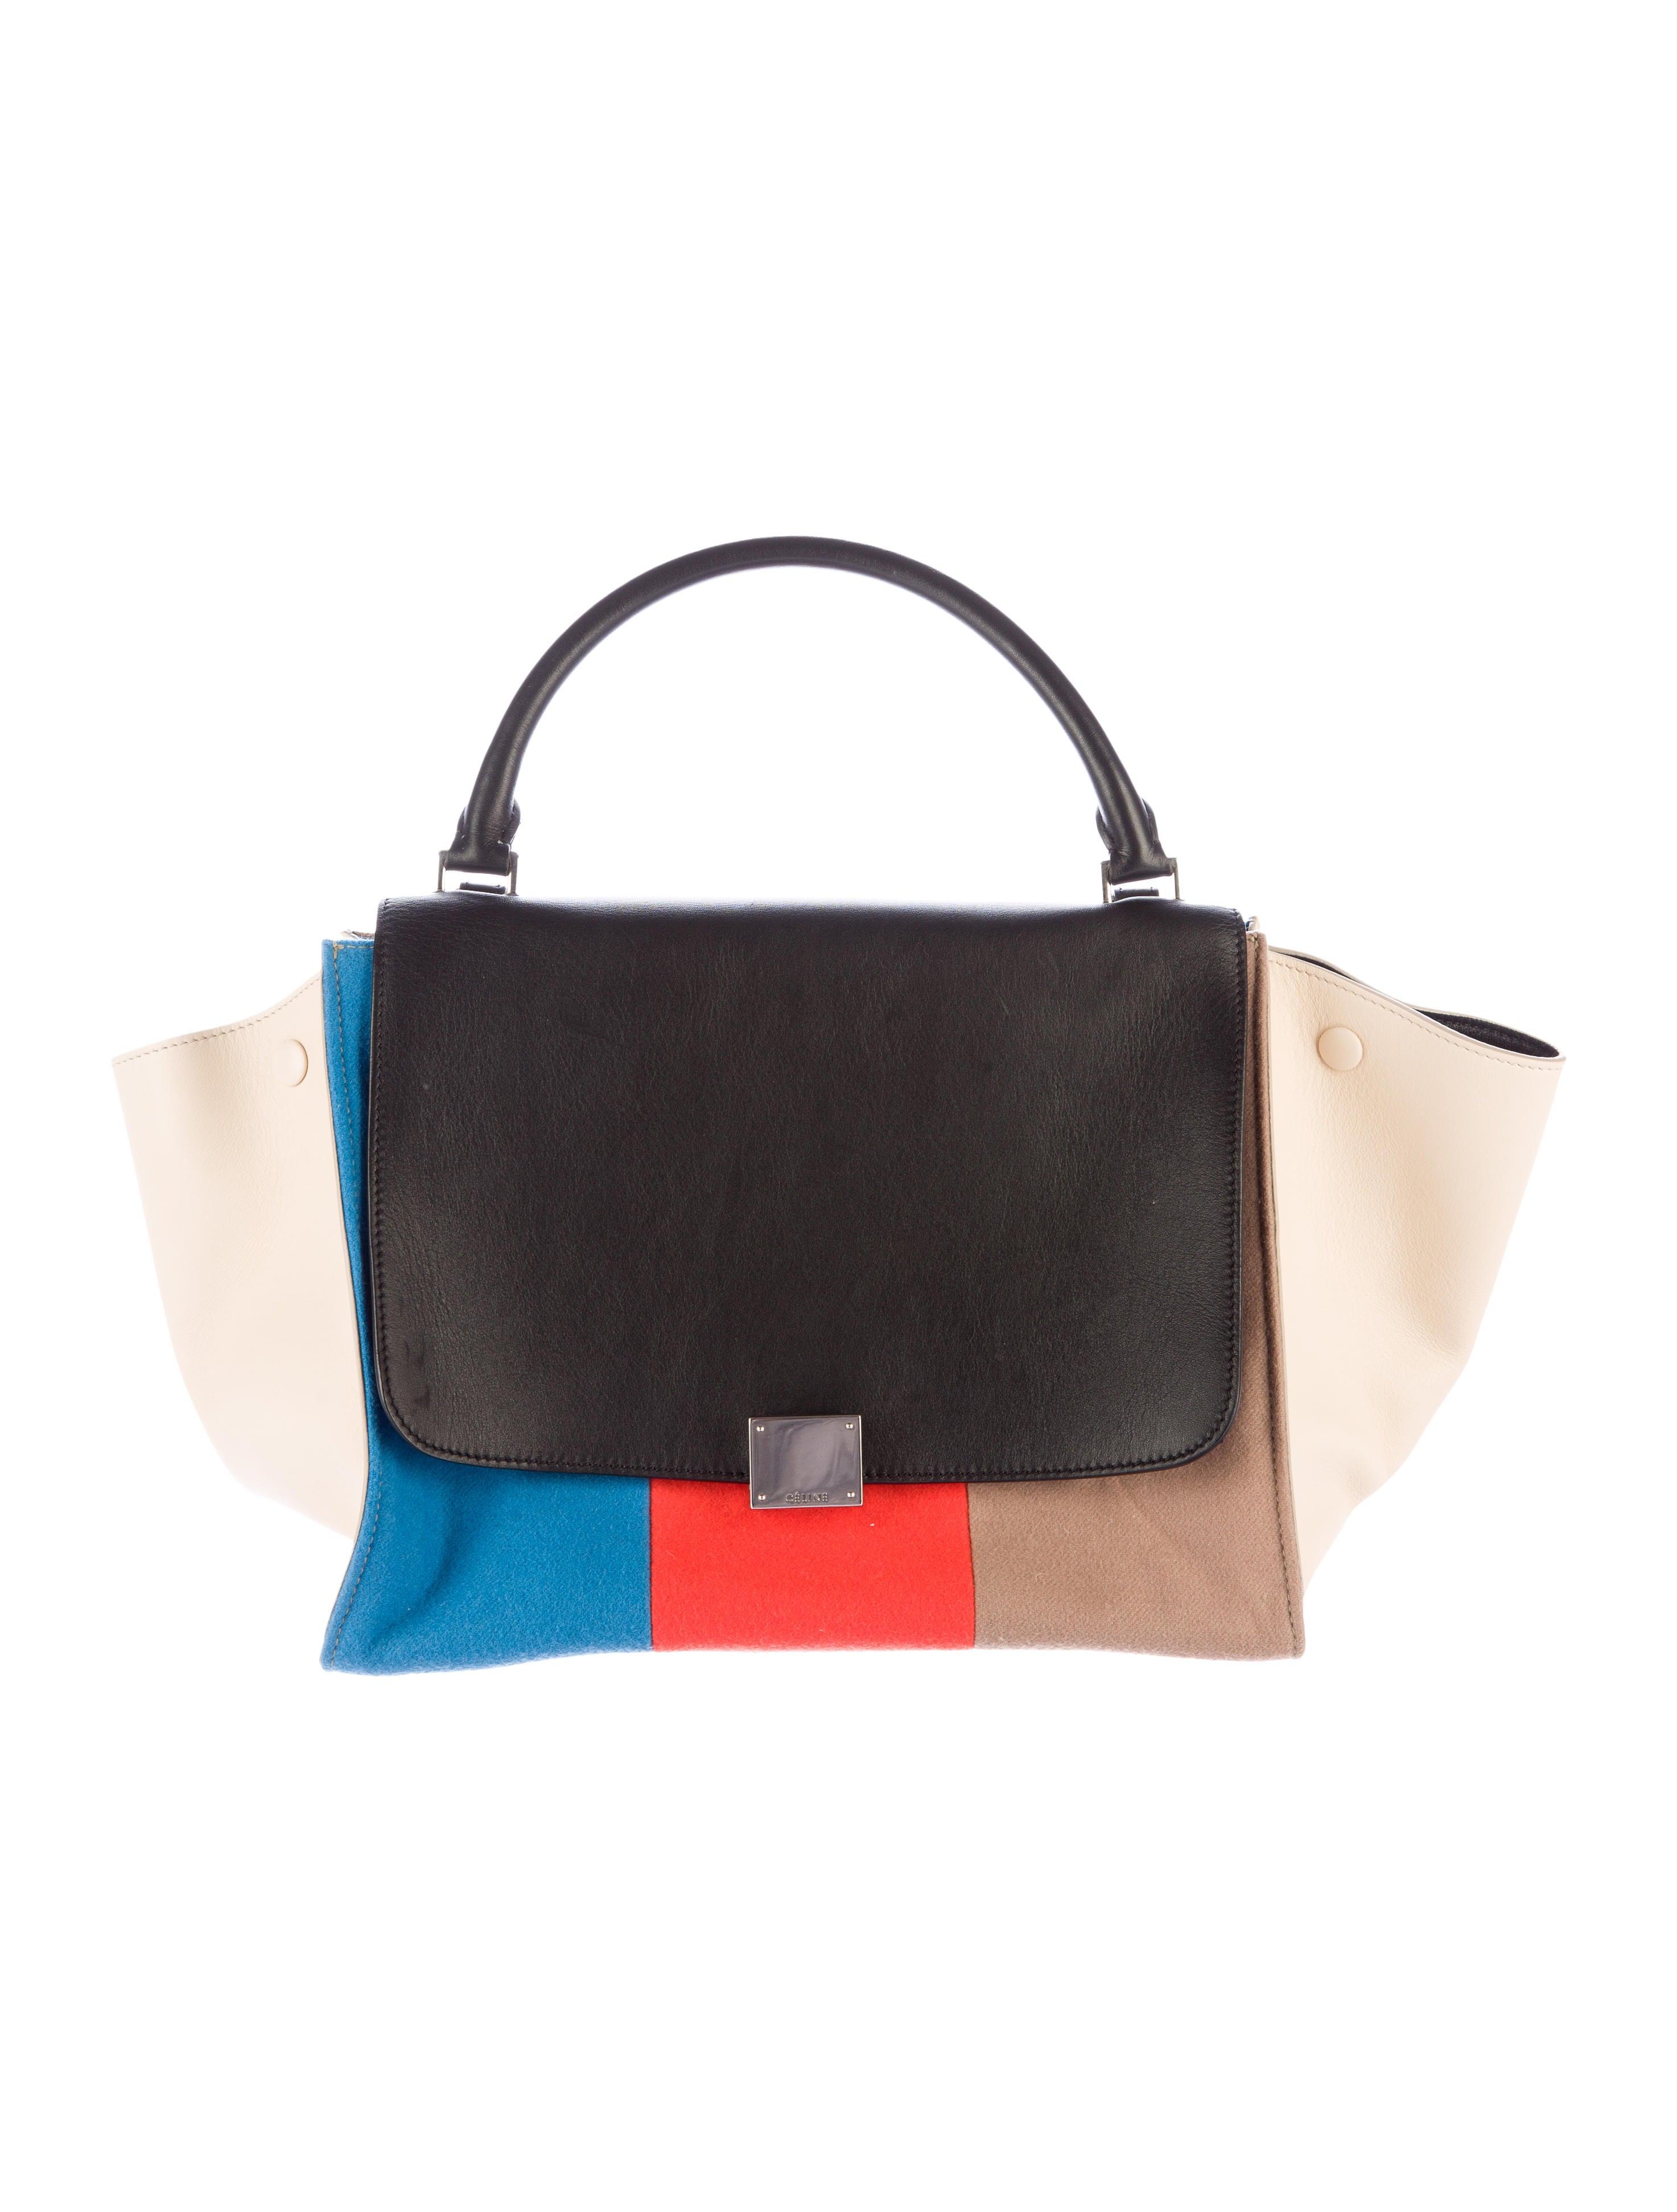 8b1daae3a0f4 Céline Colorblock Medium Trapeze Bag - Handbags - CEL42058